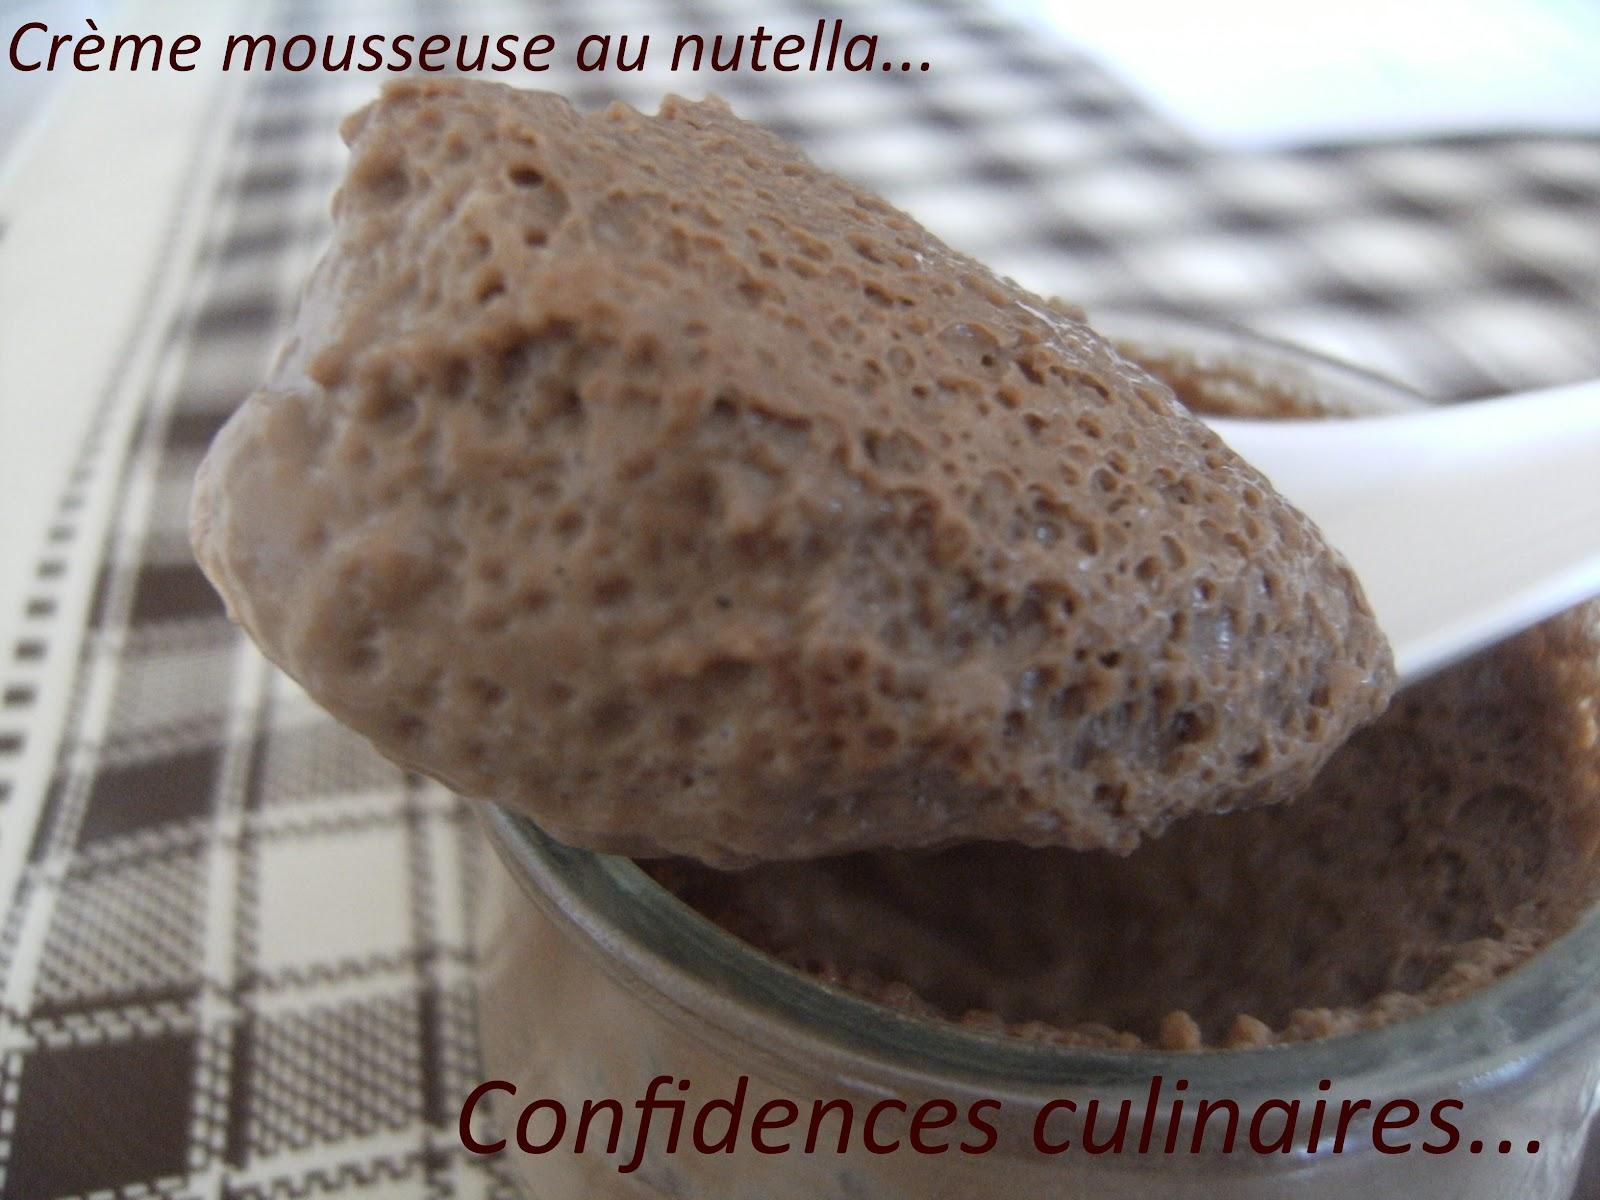 confidences culinaires cr me mousseuse au nutella ronde interblog 26. Black Bedroom Furniture Sets. Home Design Ideas